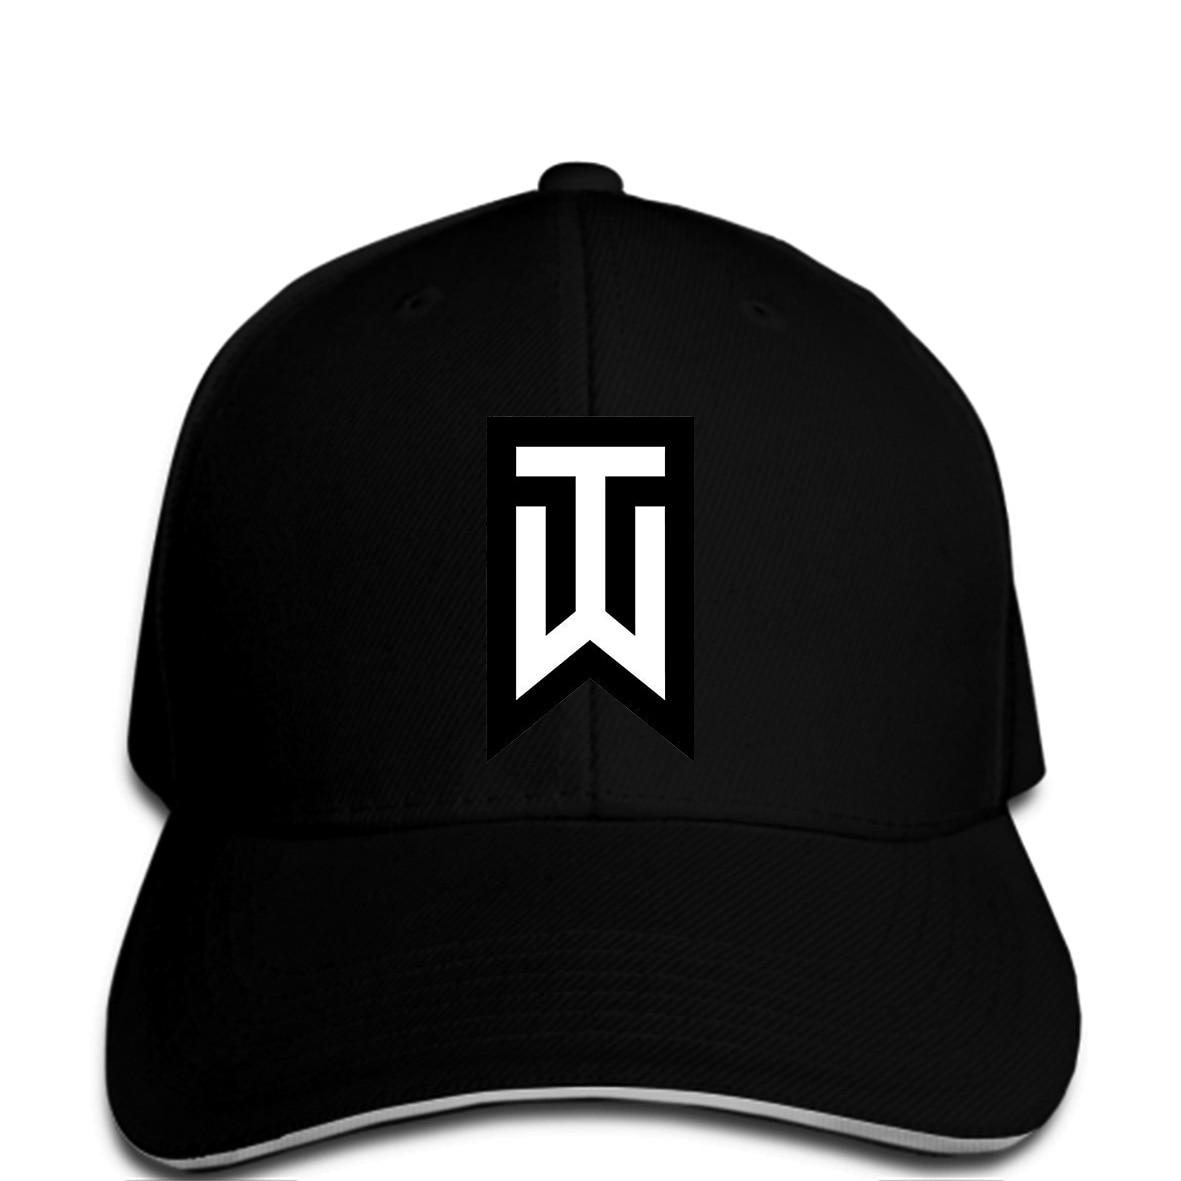 b0bcde8d8 US $9.9 |Men Baseball cap Tiger Woods Logo Baseball cap Fashion funny Hat  novelty tsnapback women-in Men's Baseball Caps from Apparel Accessories on  ...